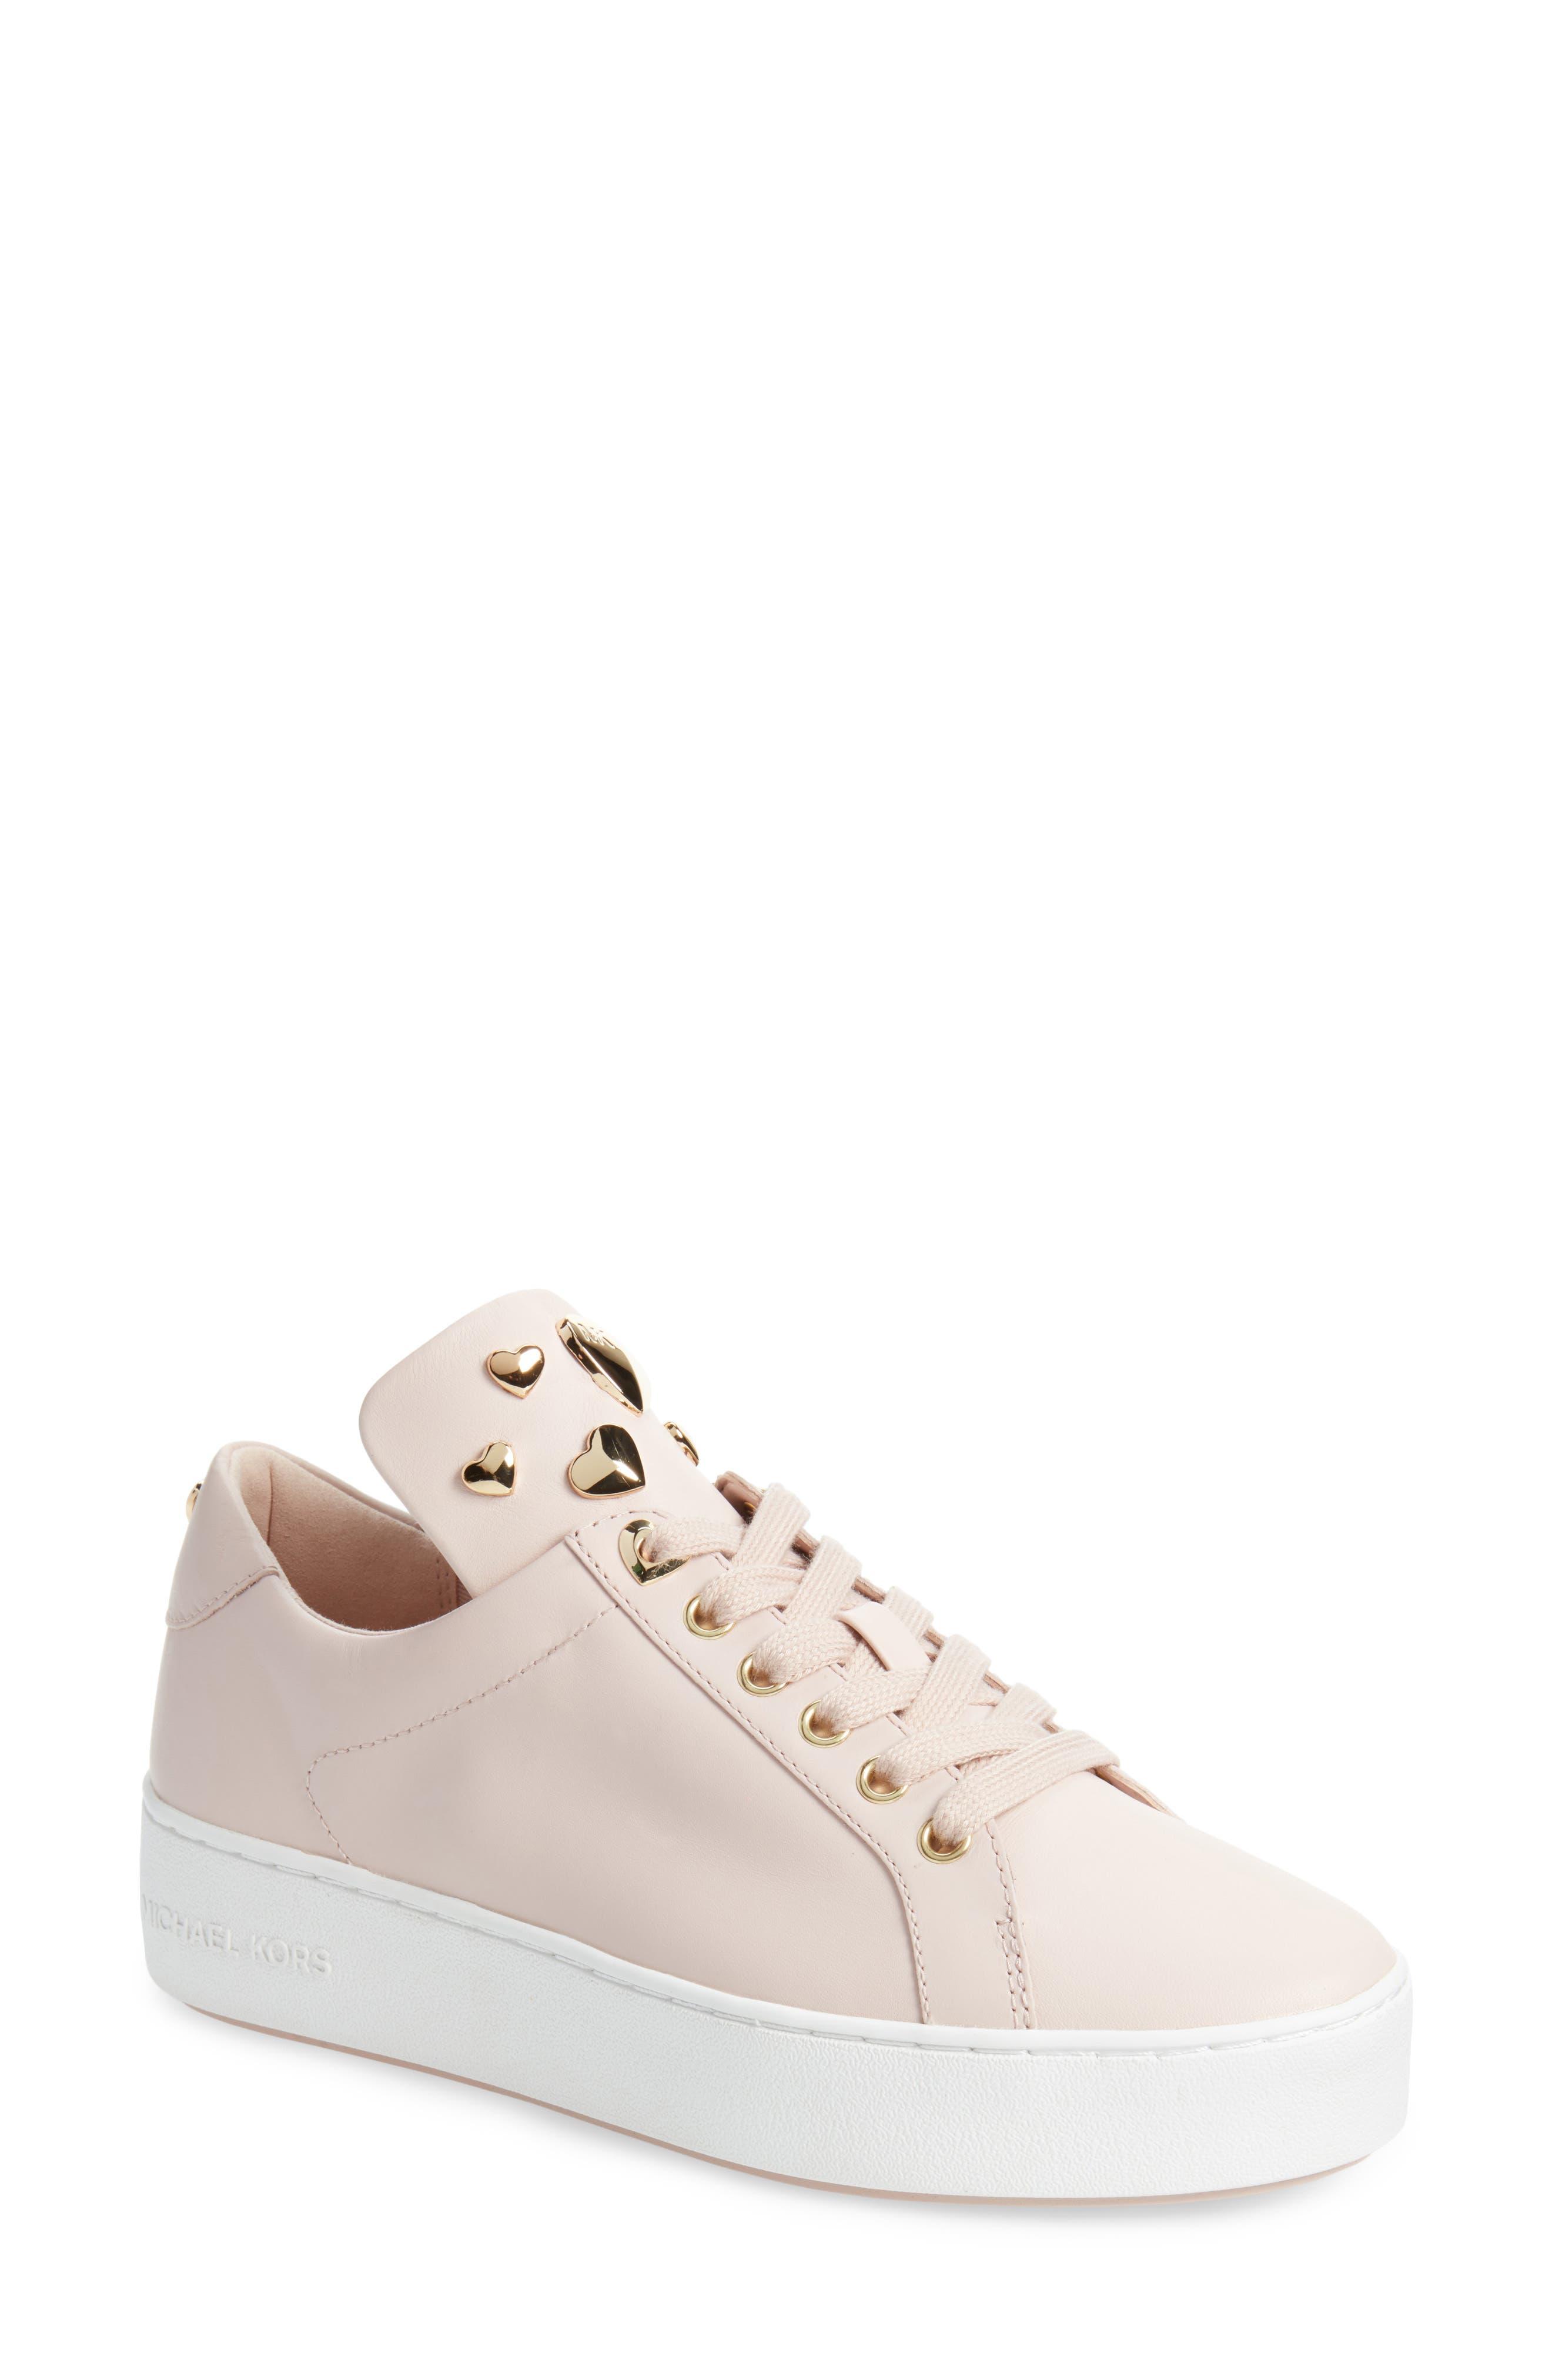 Mindy Platform Sneaker,                             Main thumbnail 1, color,                             Soft Pink Studs